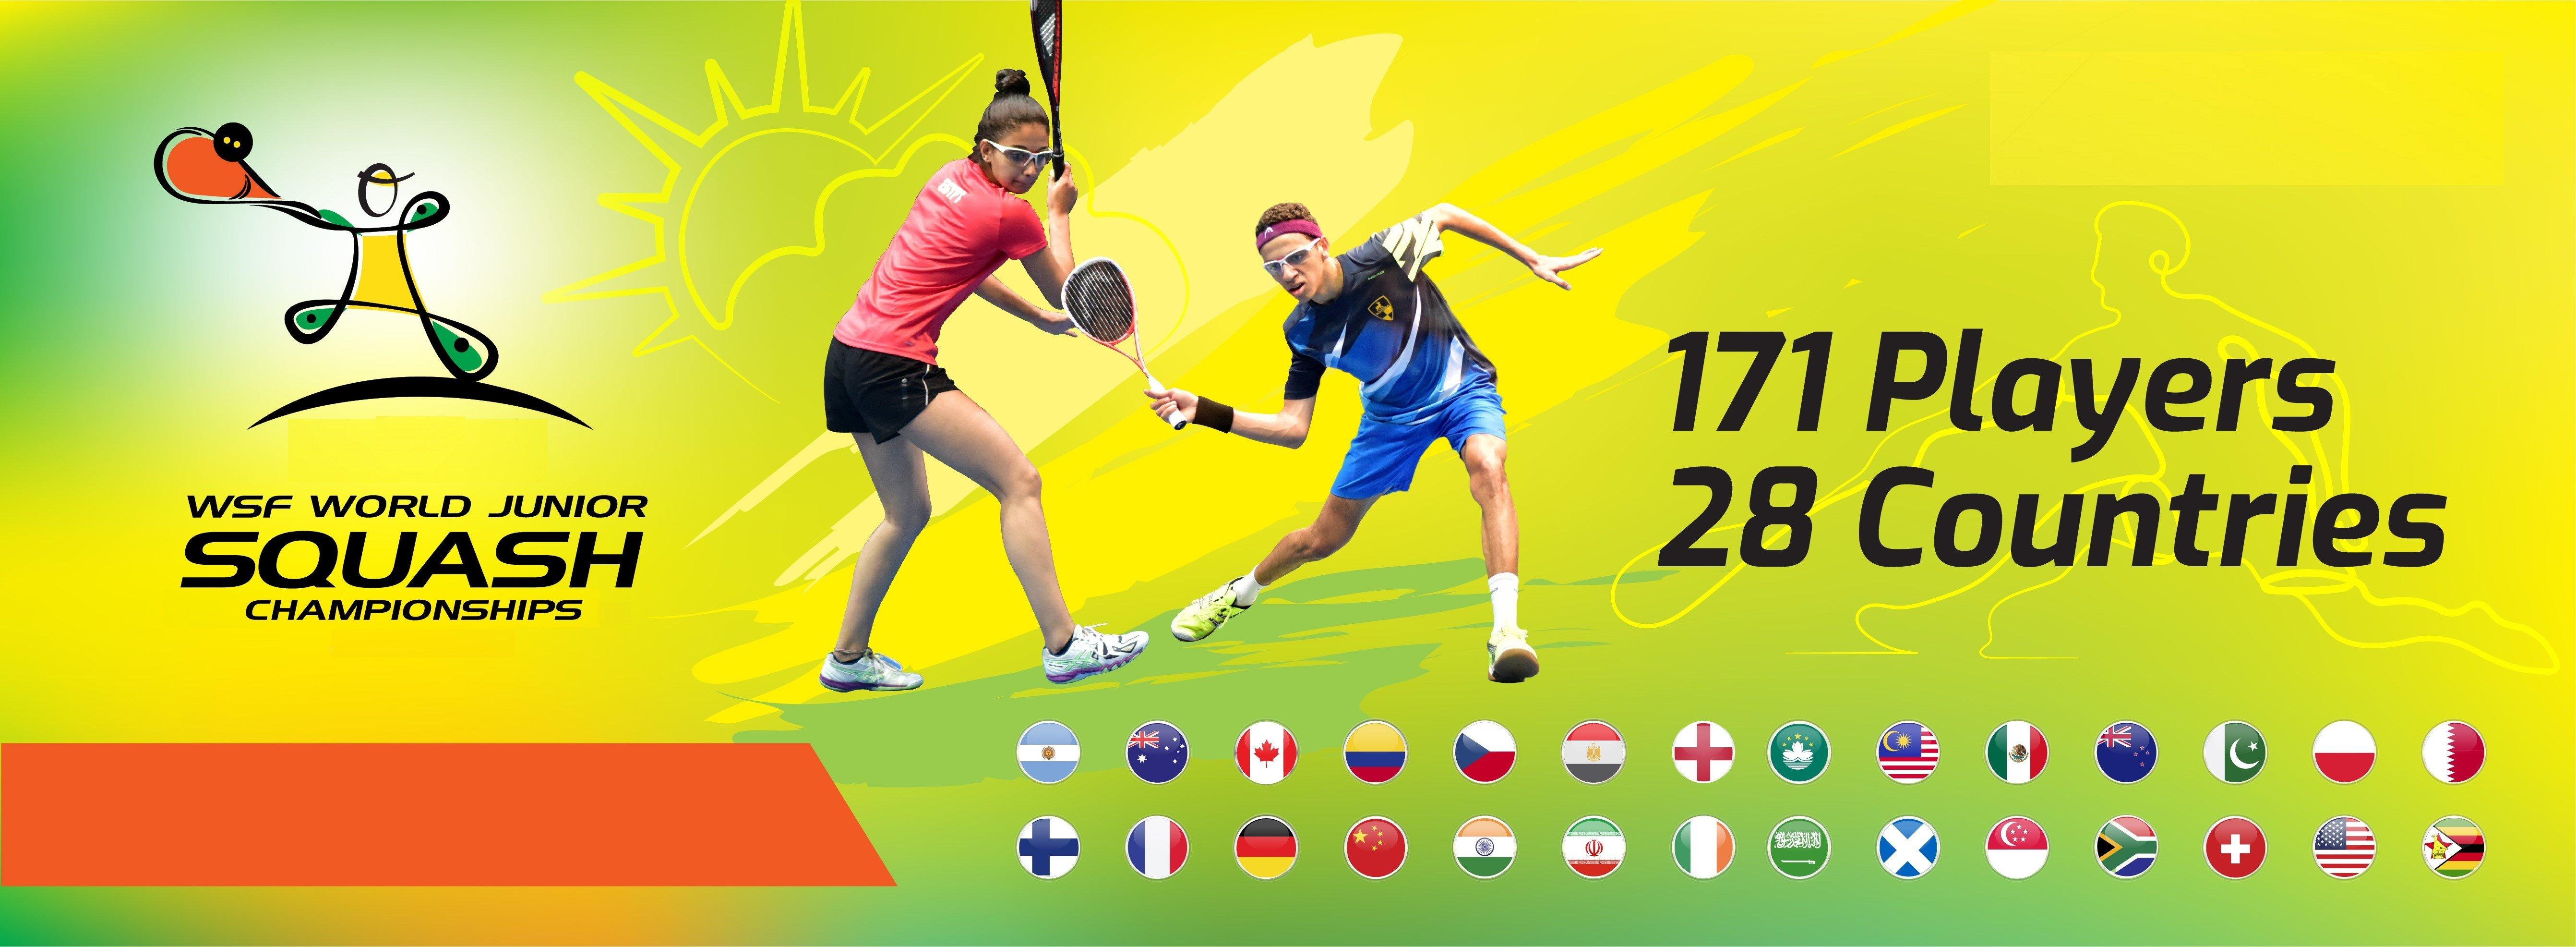 WSF World Junior Squash Championships